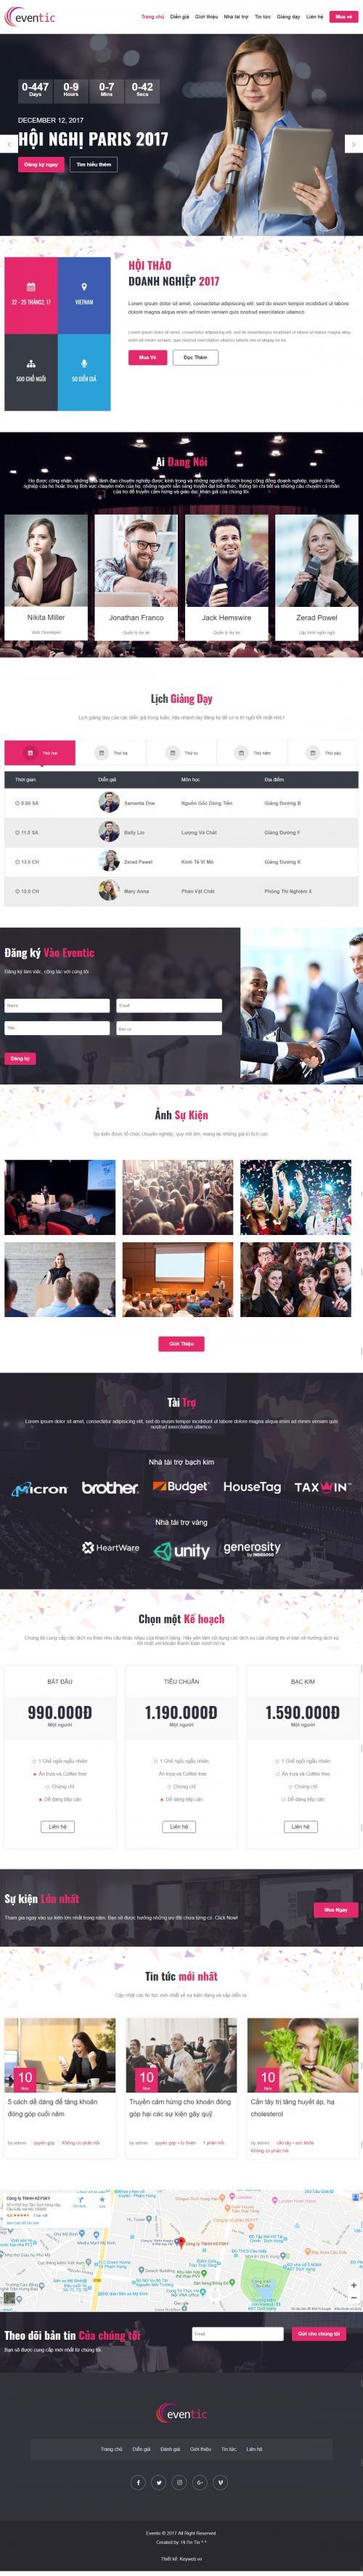 Thiết kế website dạy học 2